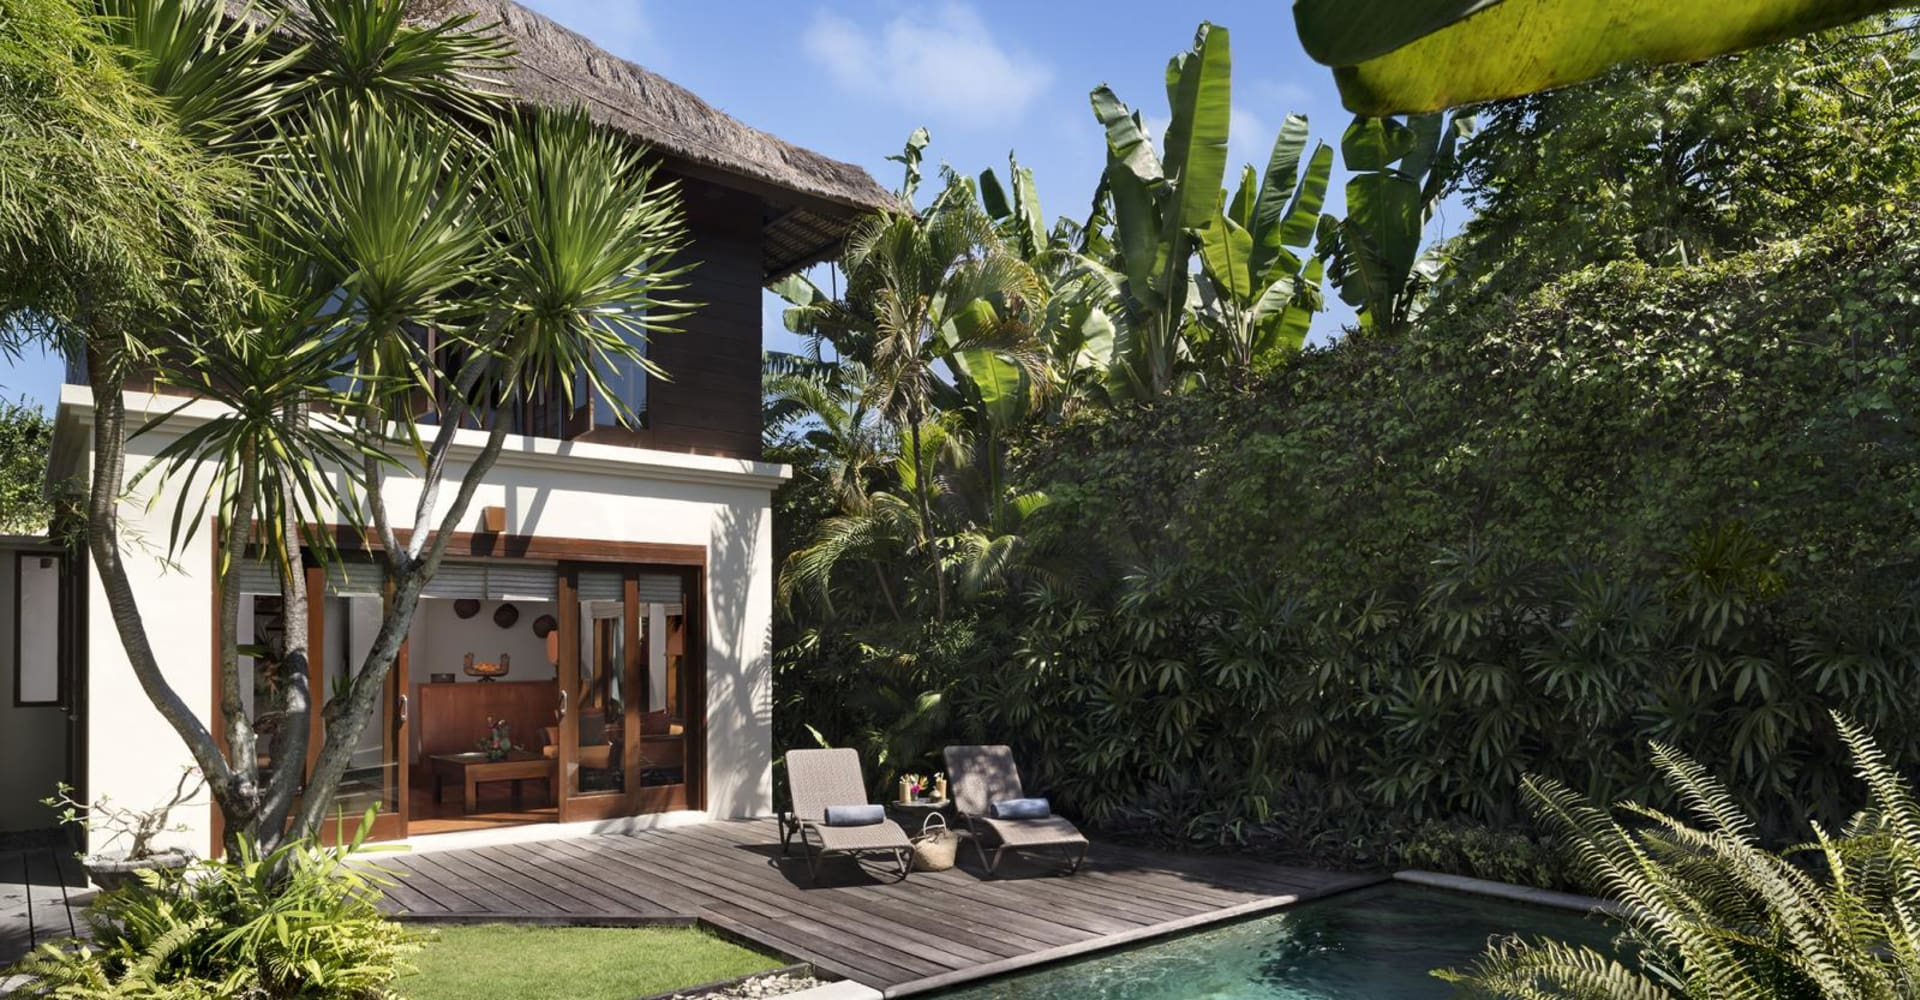 Honeymoon - The Pavilions Bali